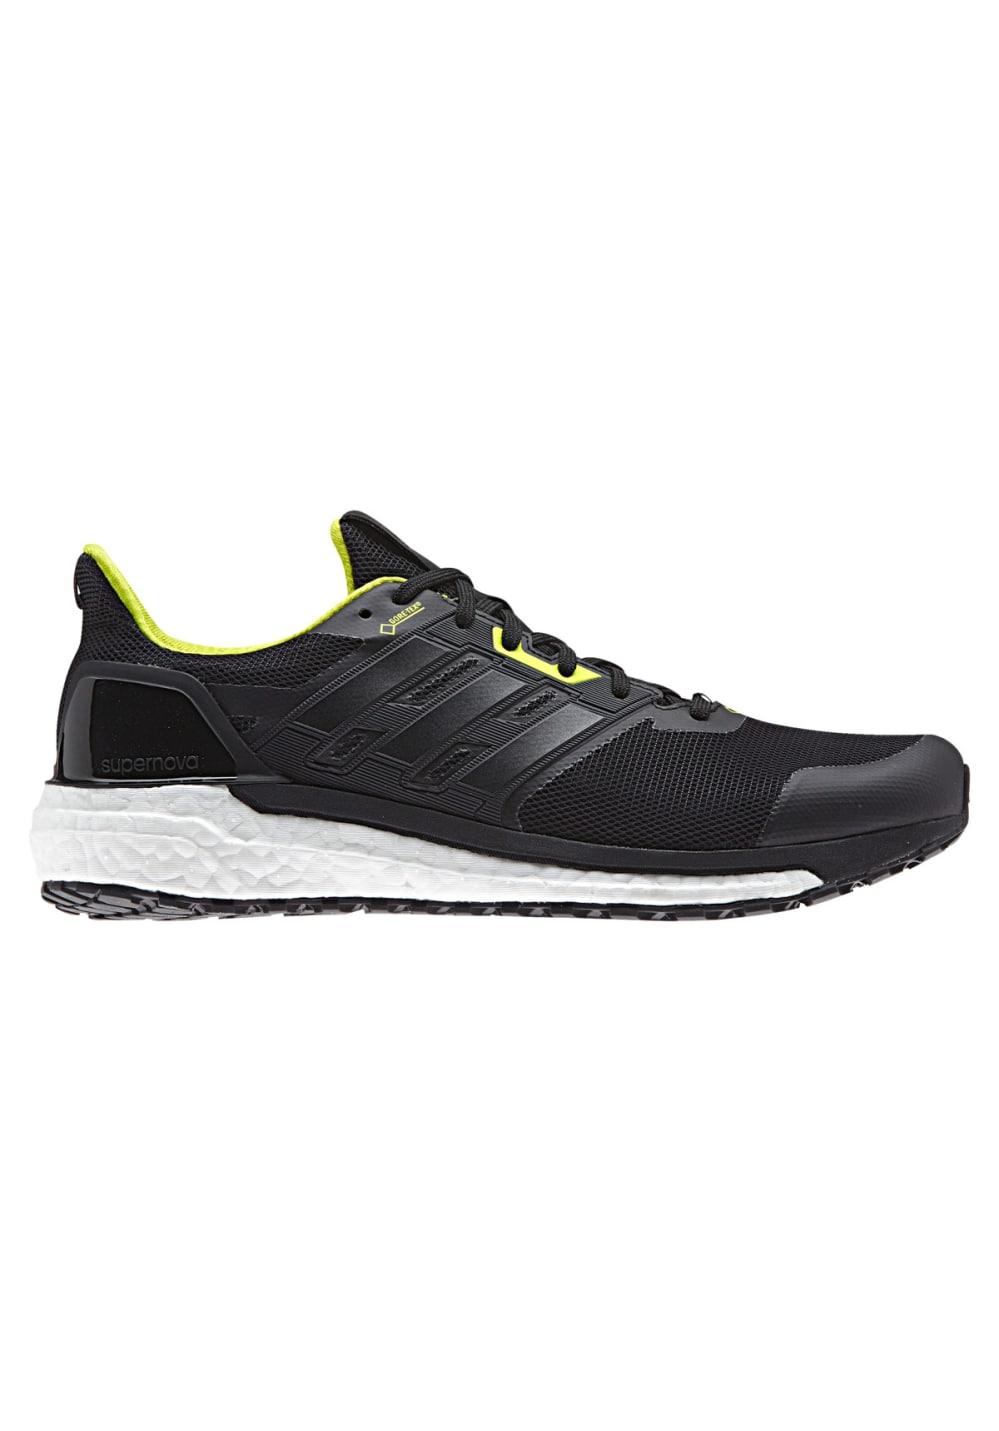 watch d99c2 91e8e adidas Supernova Gore-Tex - Running shoes for Men - Black   21RUN